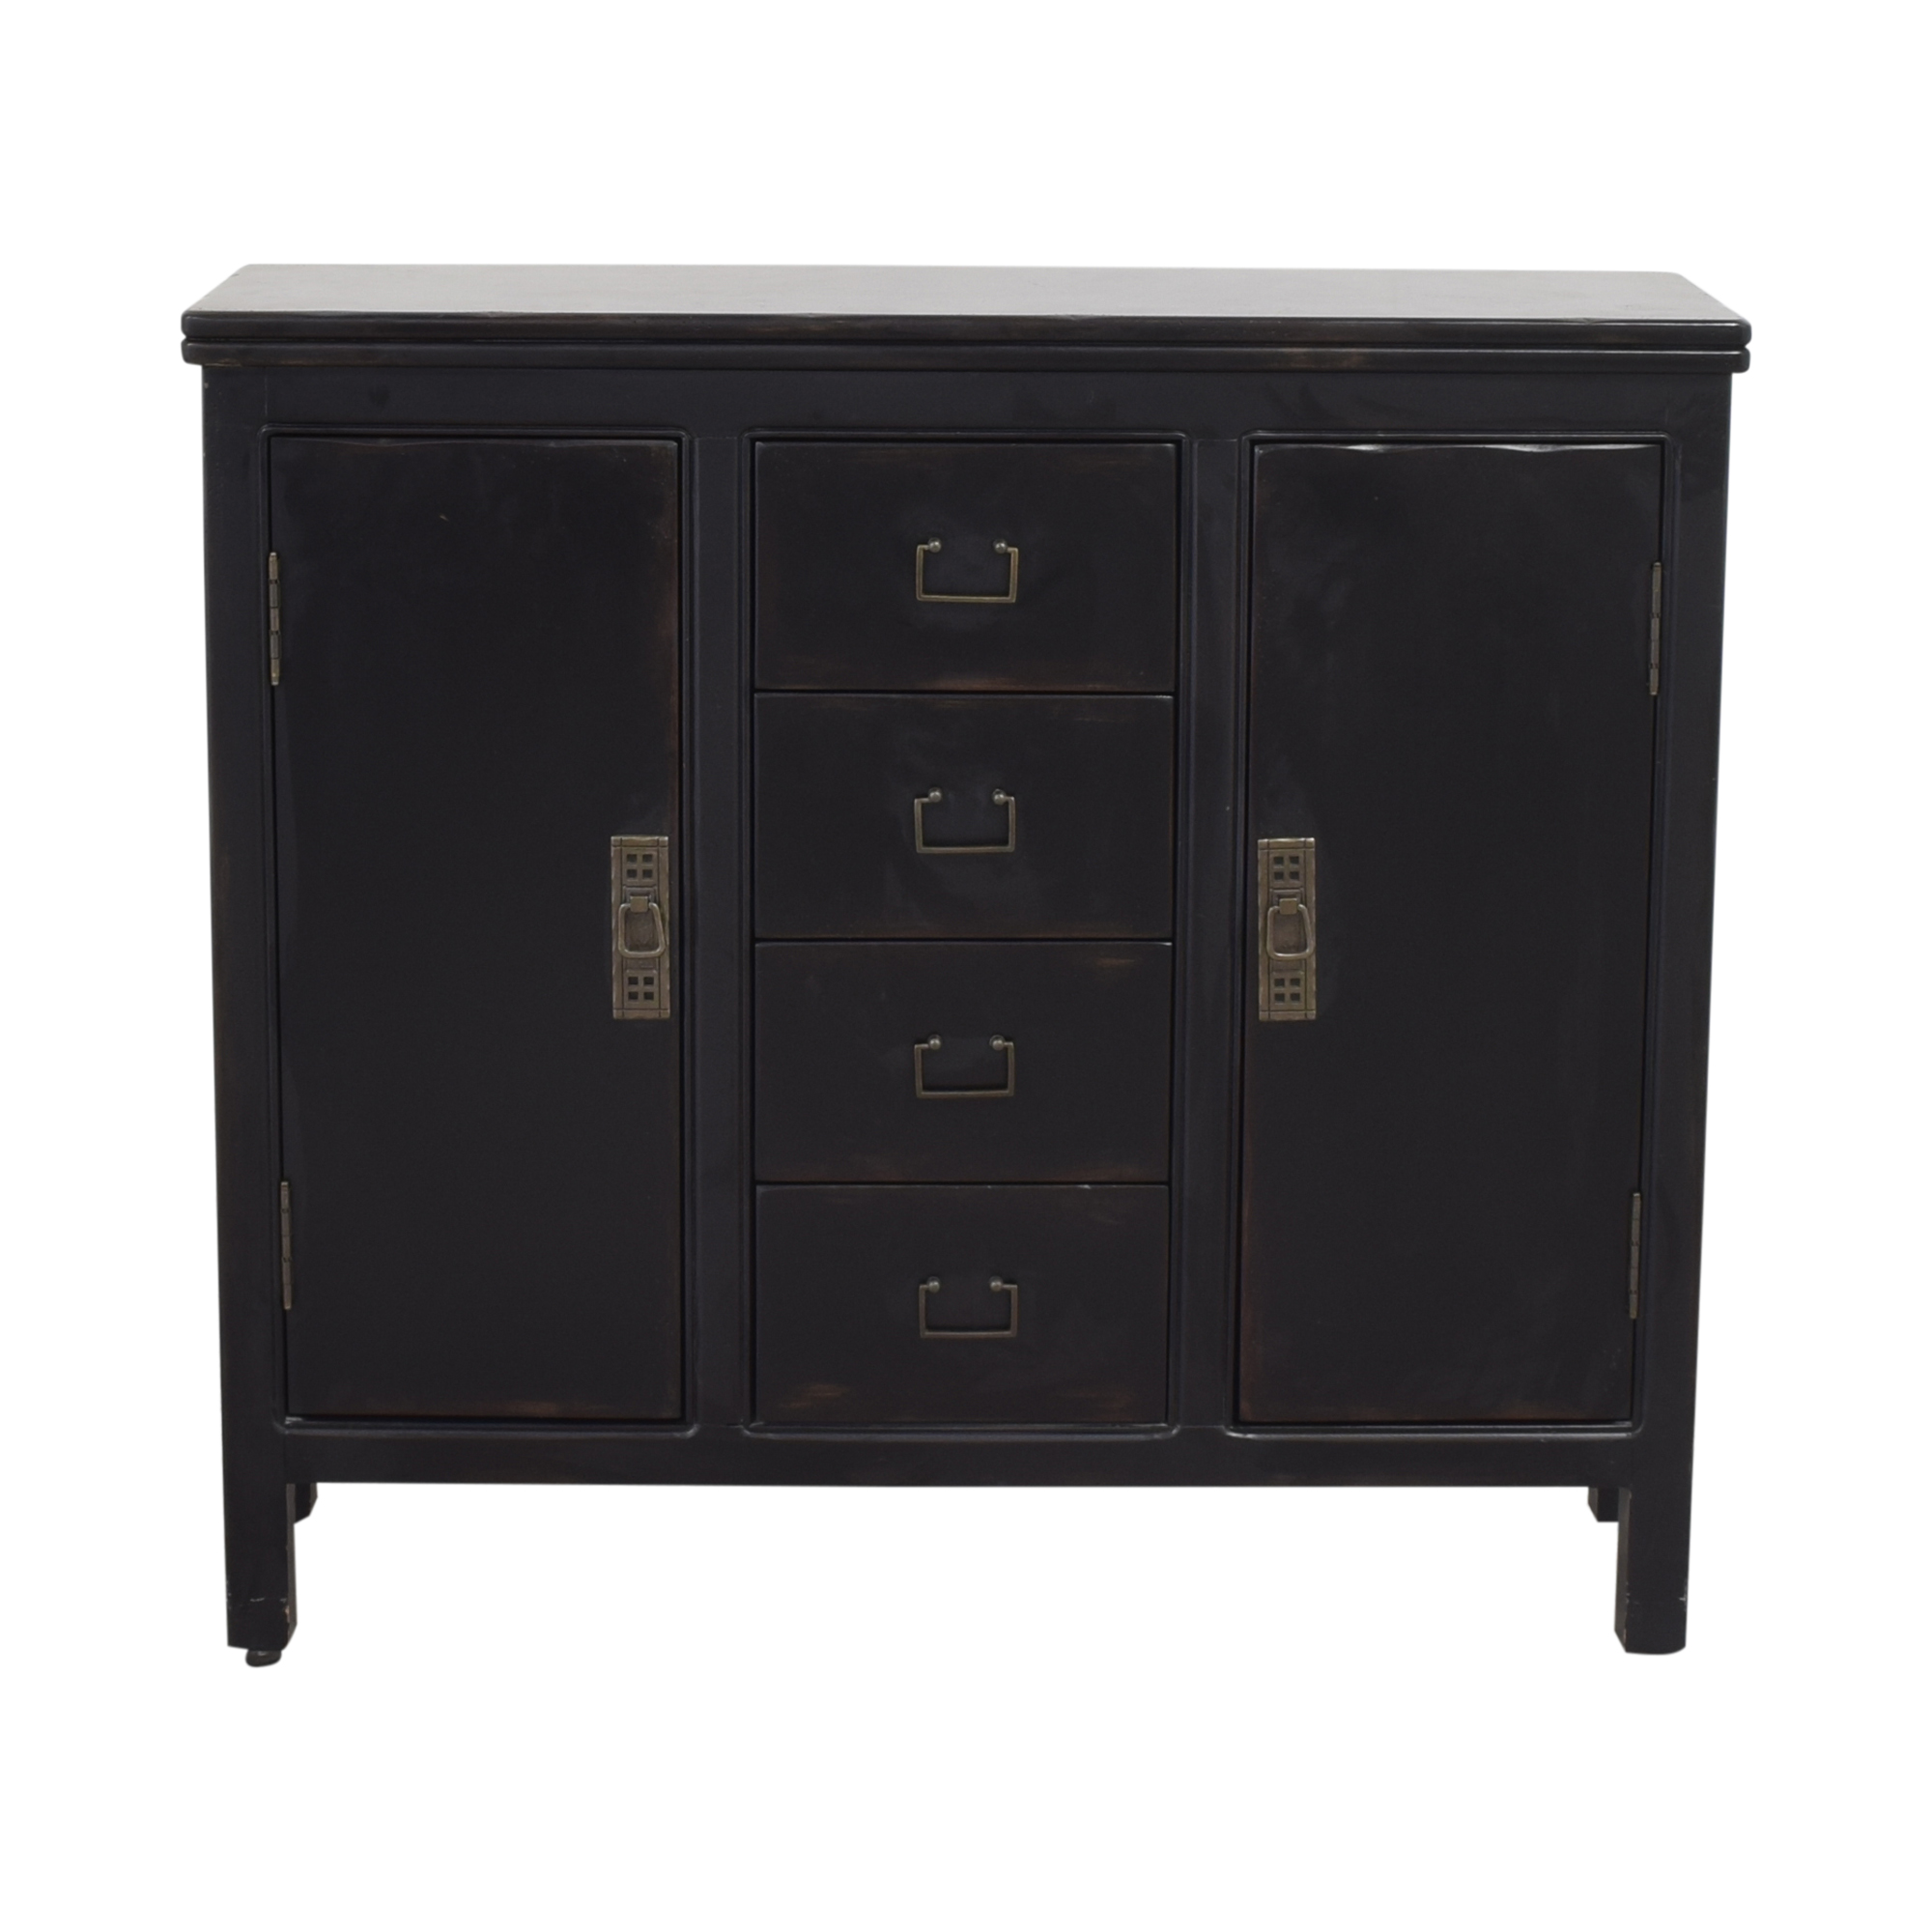 Hooker Furniture Hooker Furniture Chinoiserie Sideboard Cabinet Cabinets & Sideboards